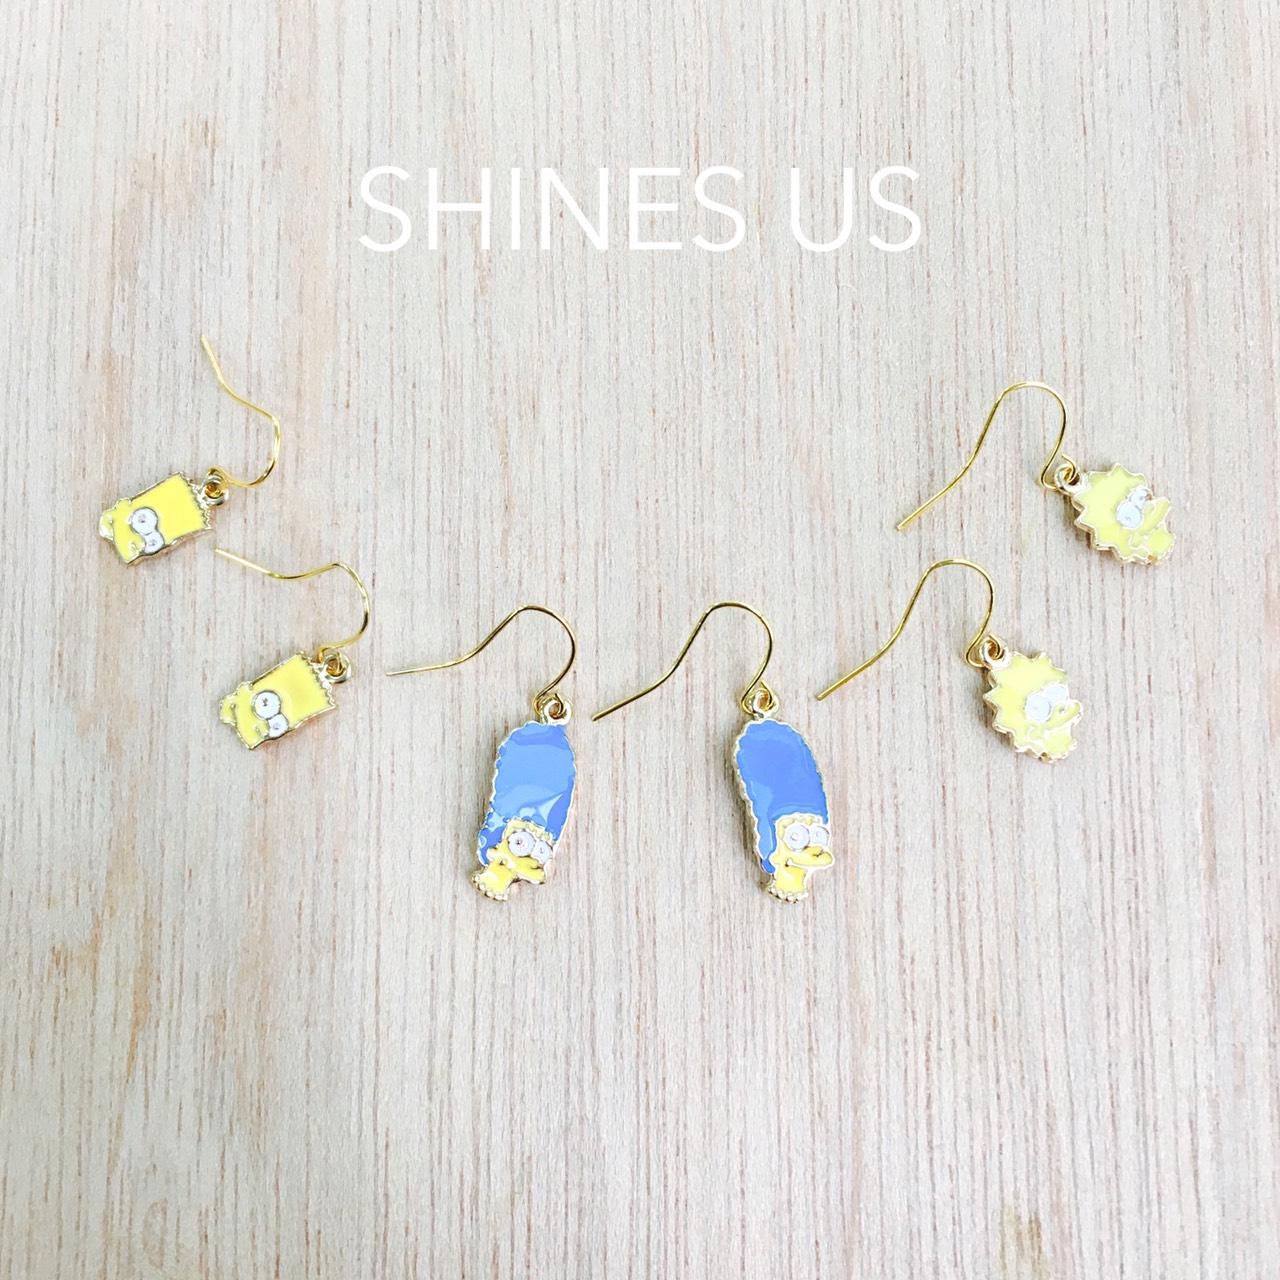 【SHINES US】正韓 辛普森家族耳環 (可改耳夾式)